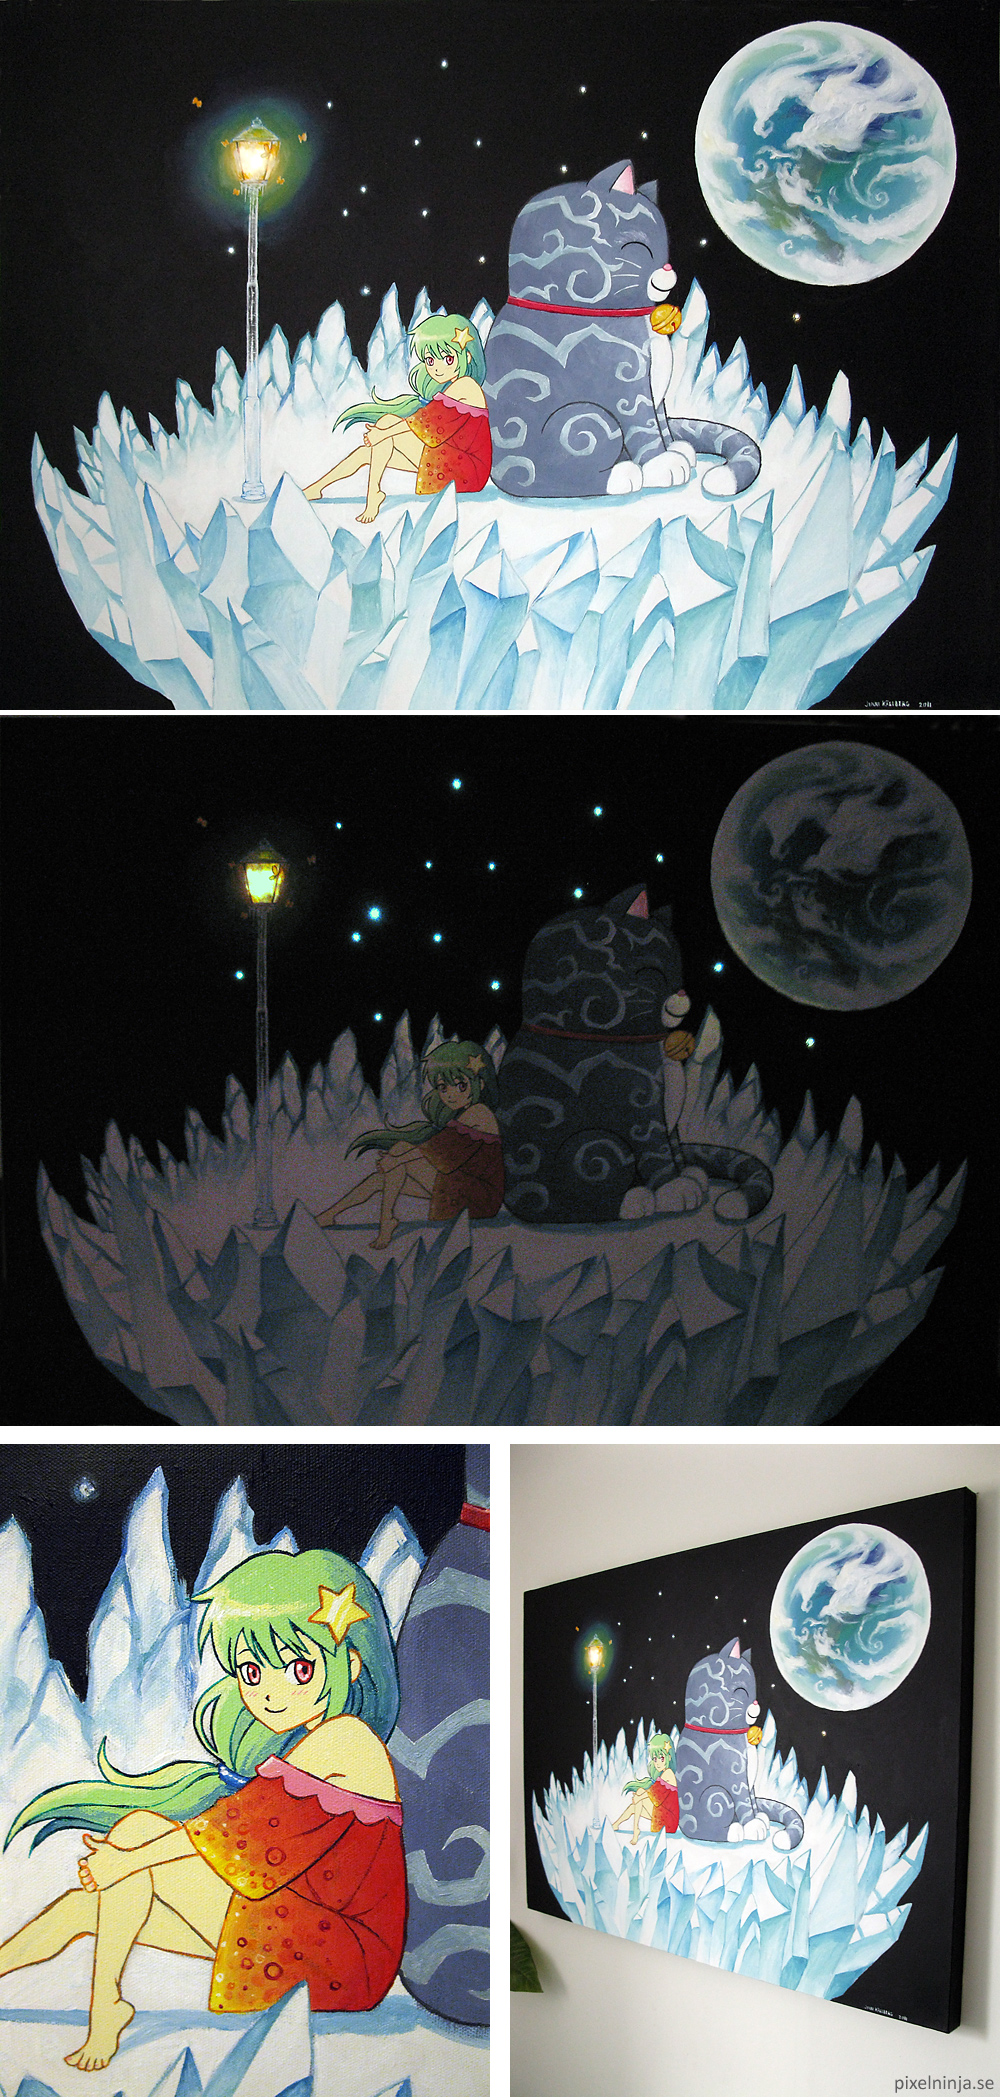 Star sky by pixel-ninja